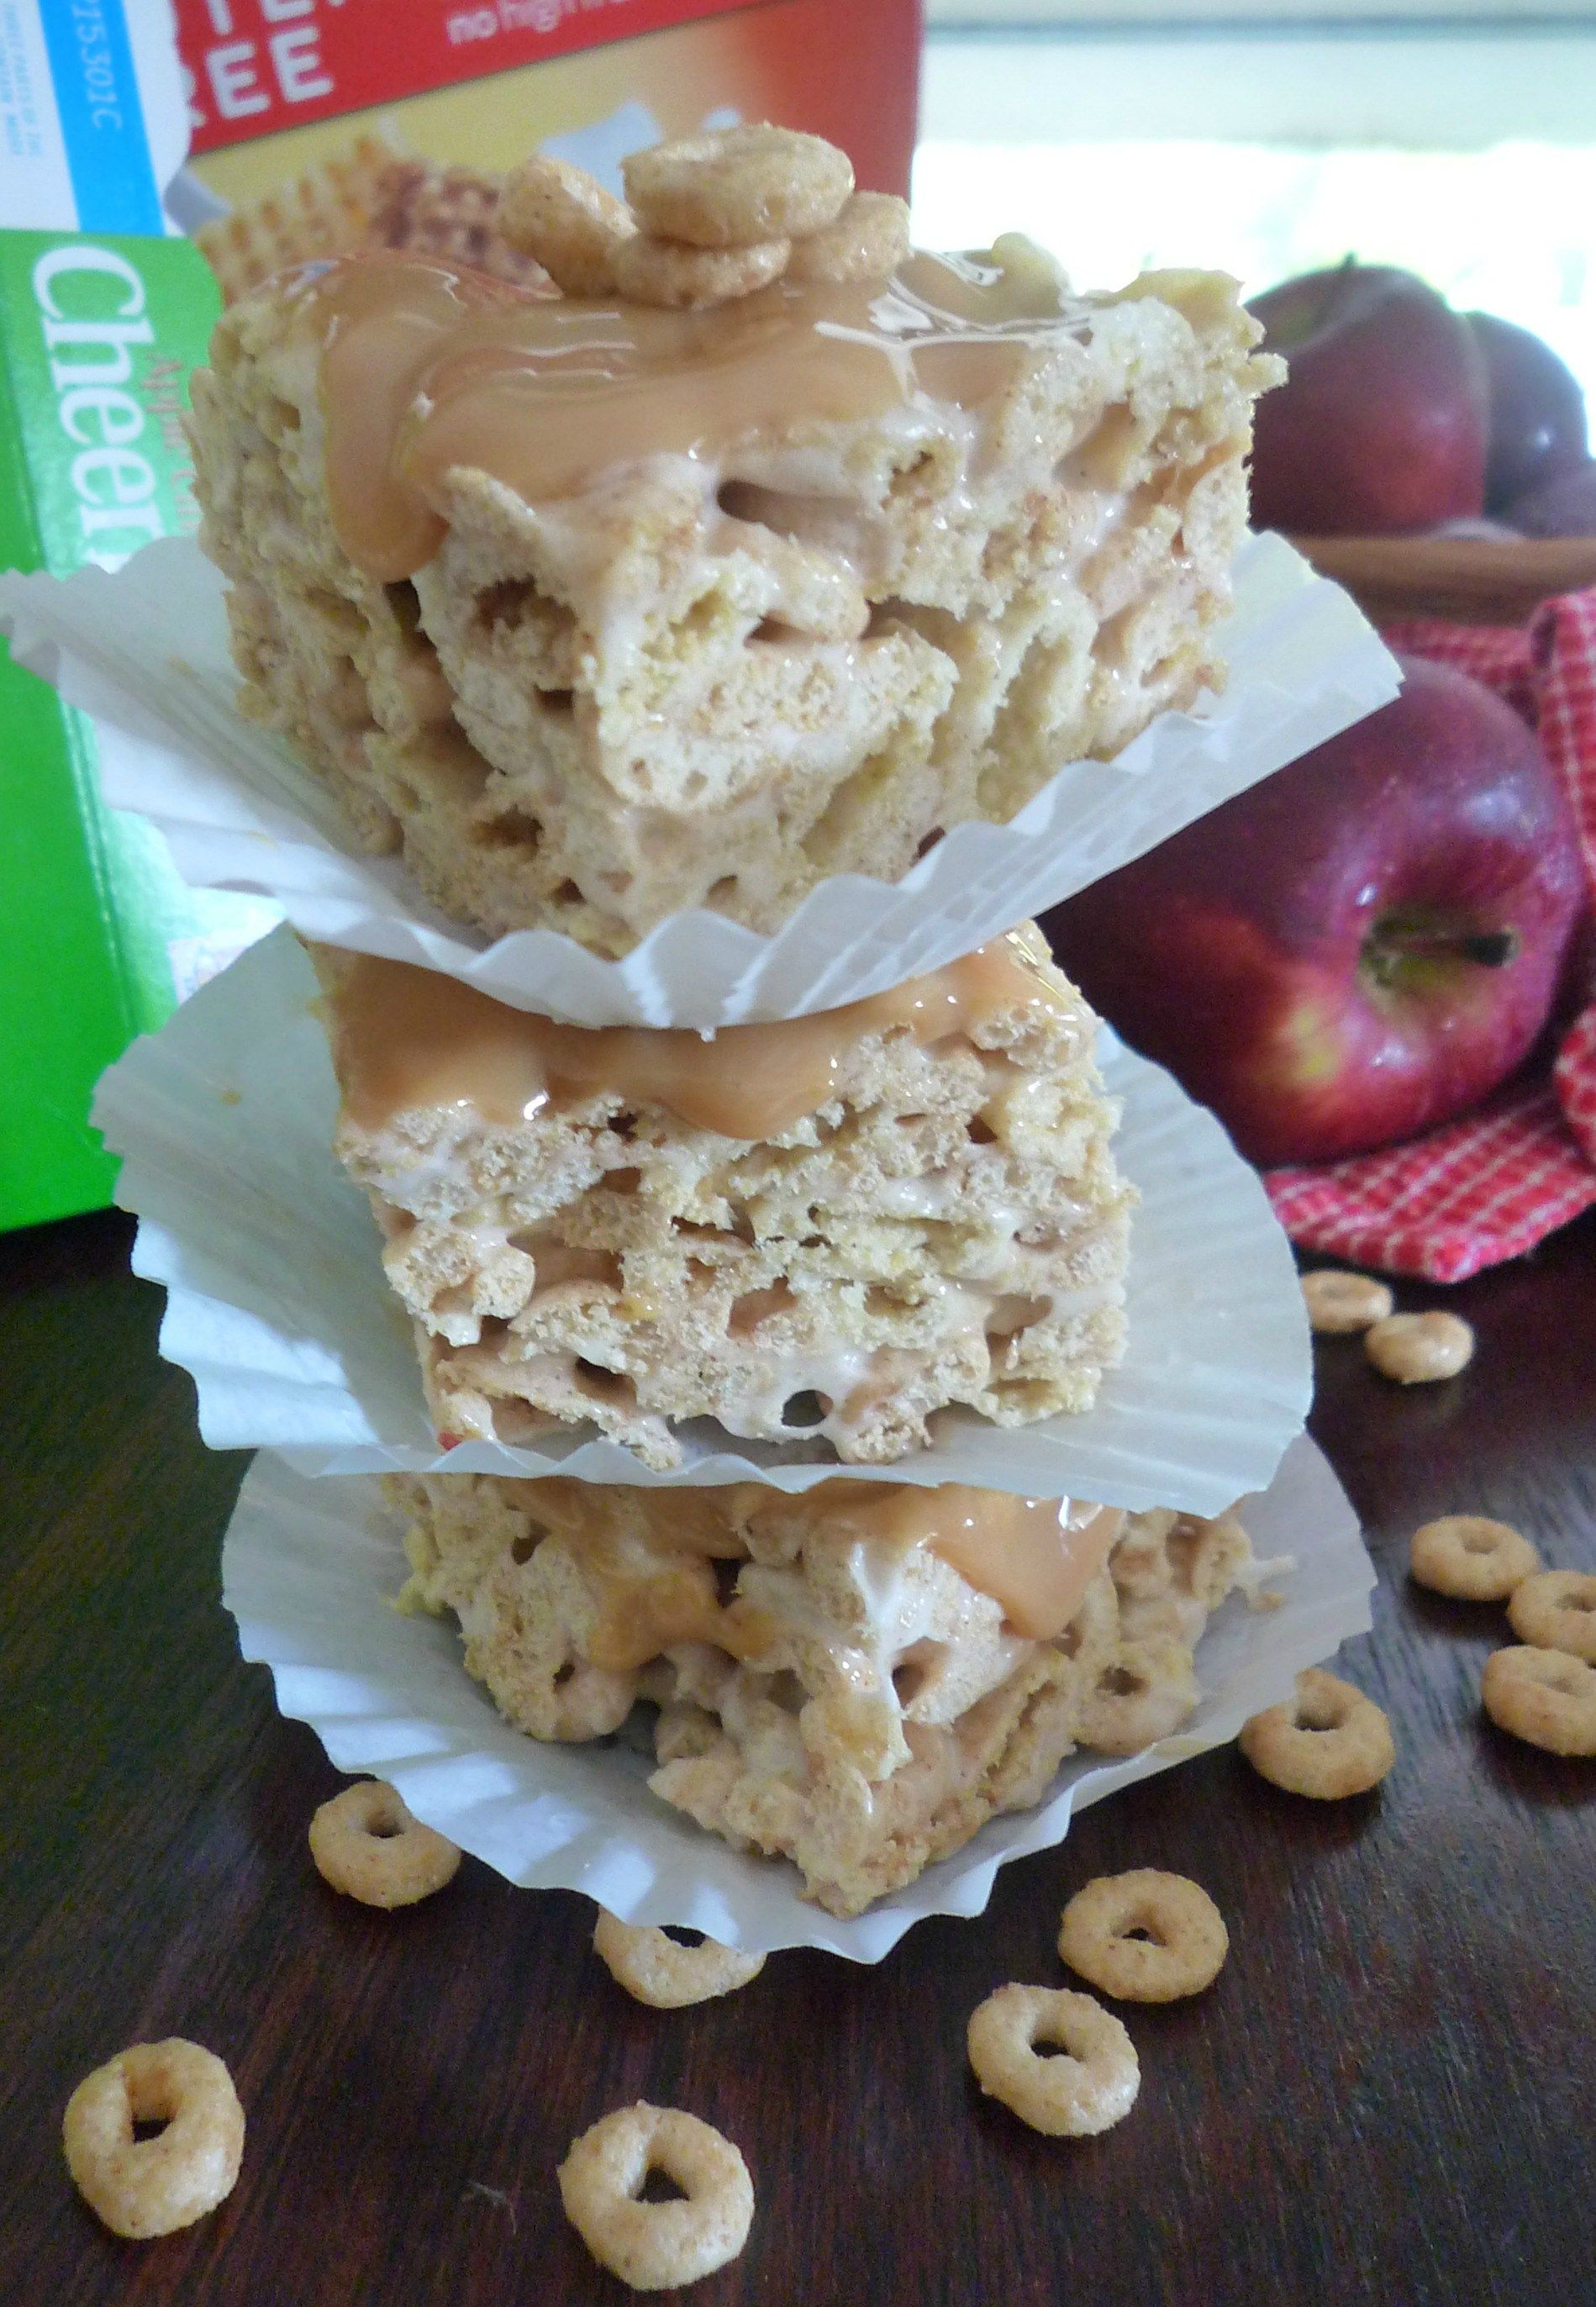 My delicious glutenfree caramel apple cheerio treats are